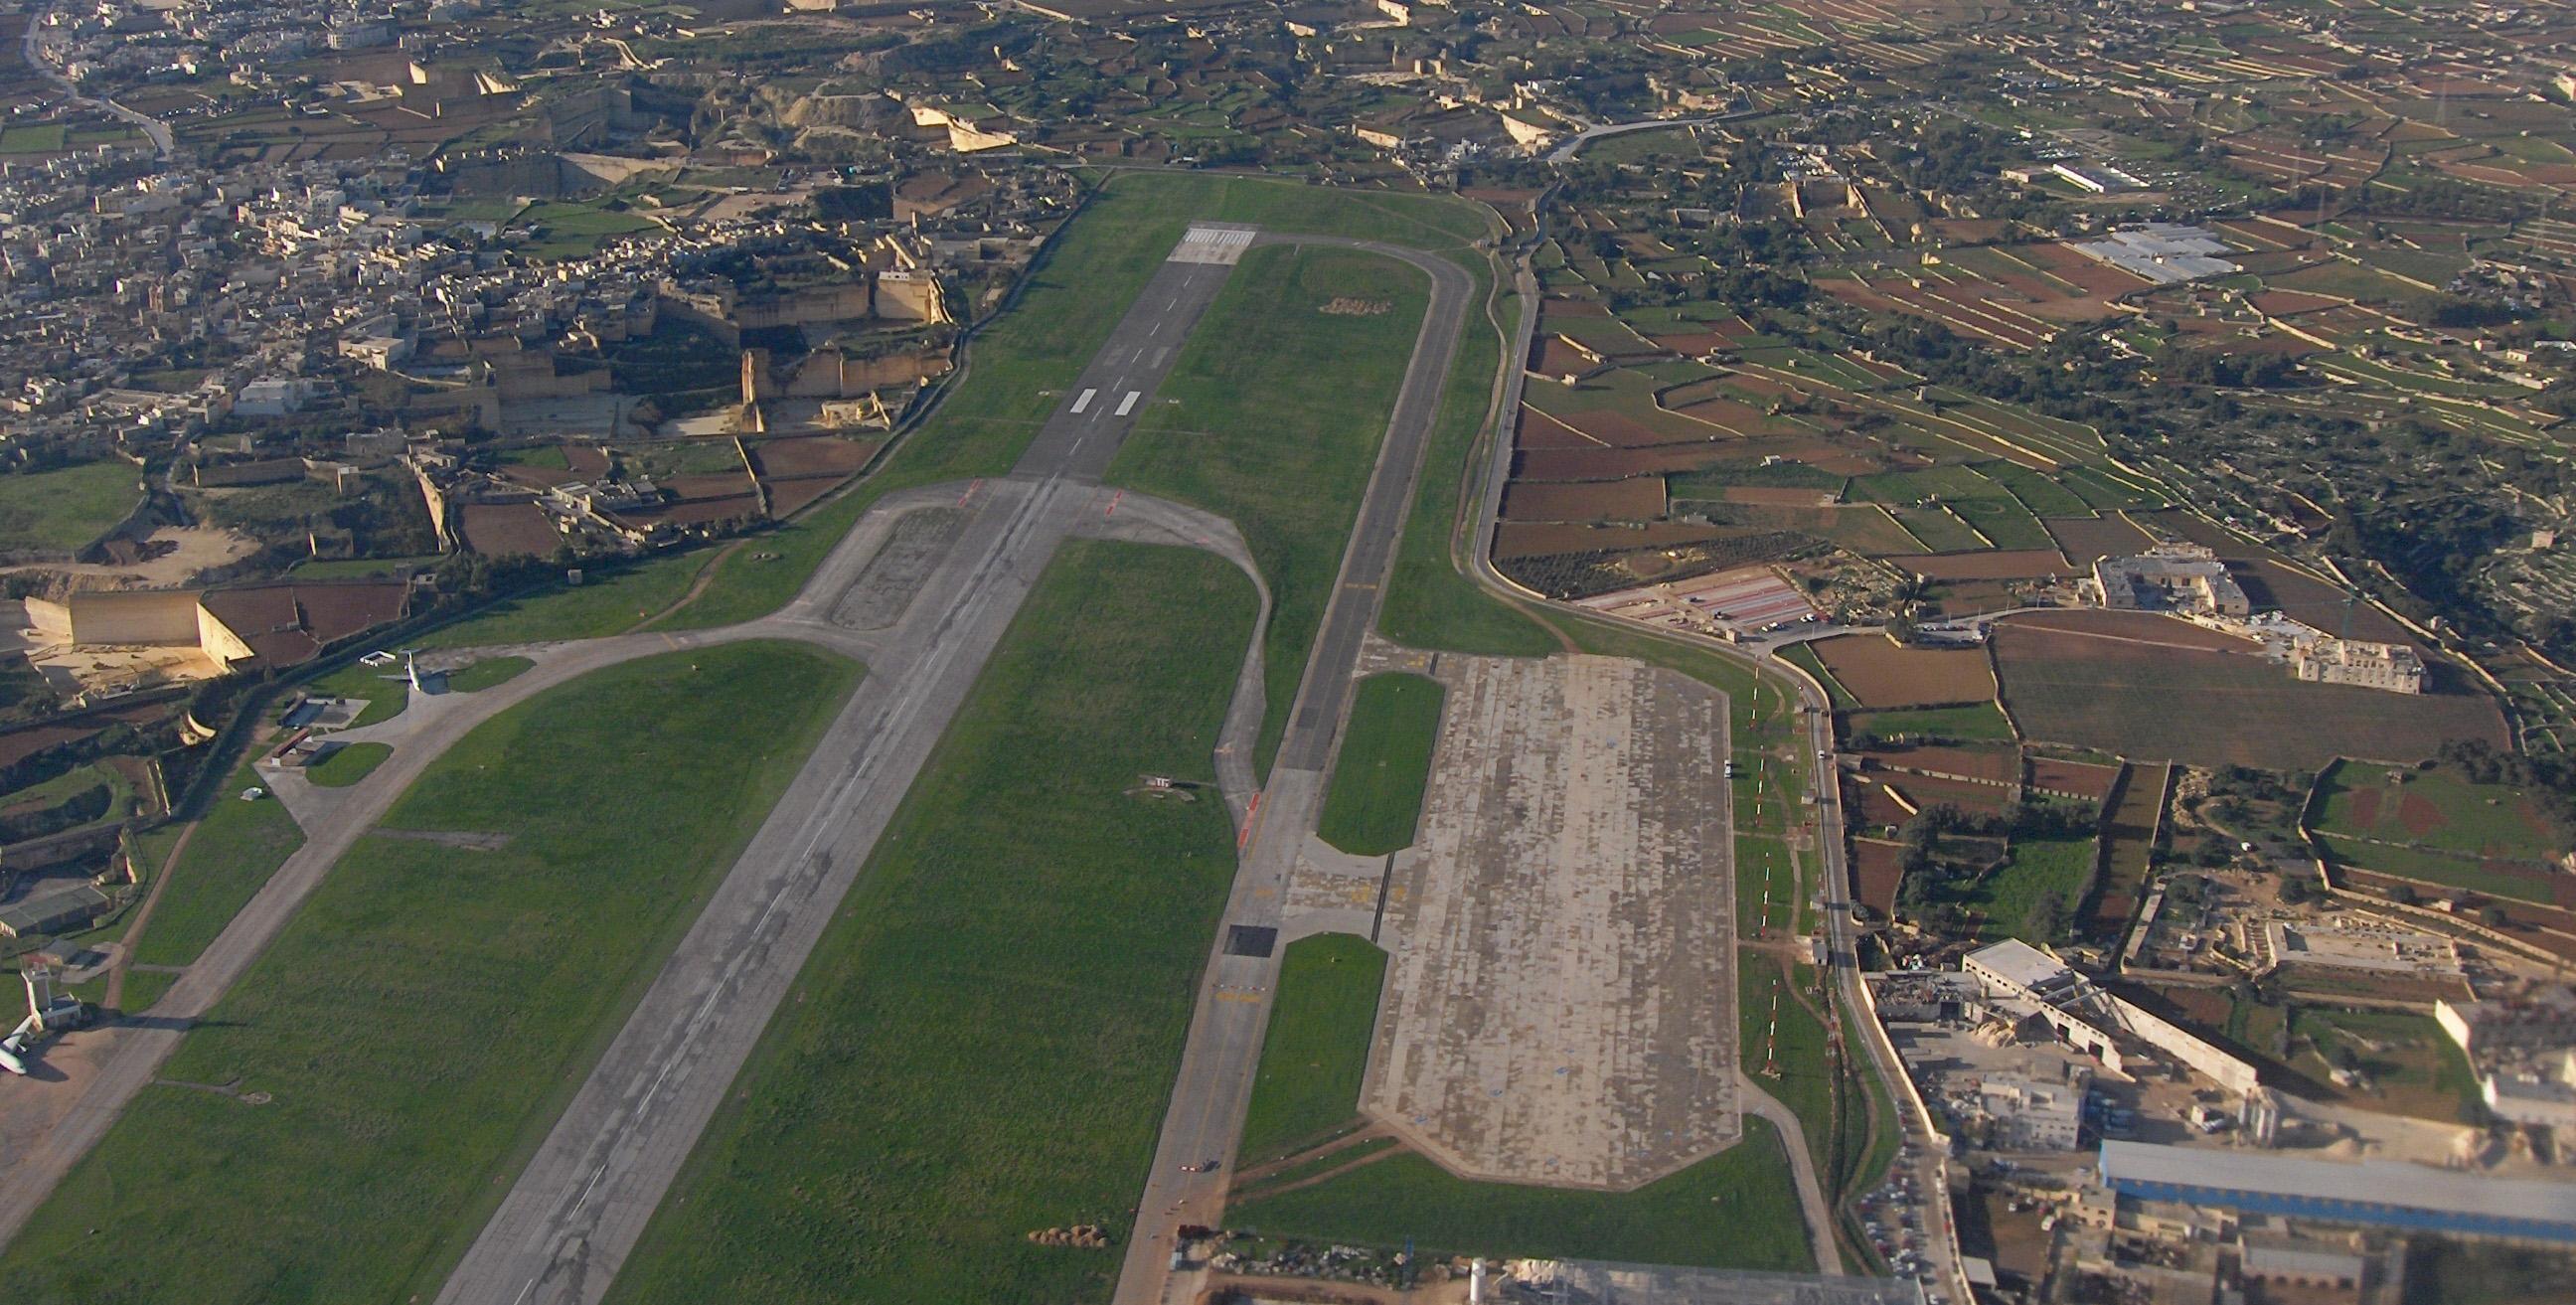 MALTA AIRPORT - Credit: John Haslam